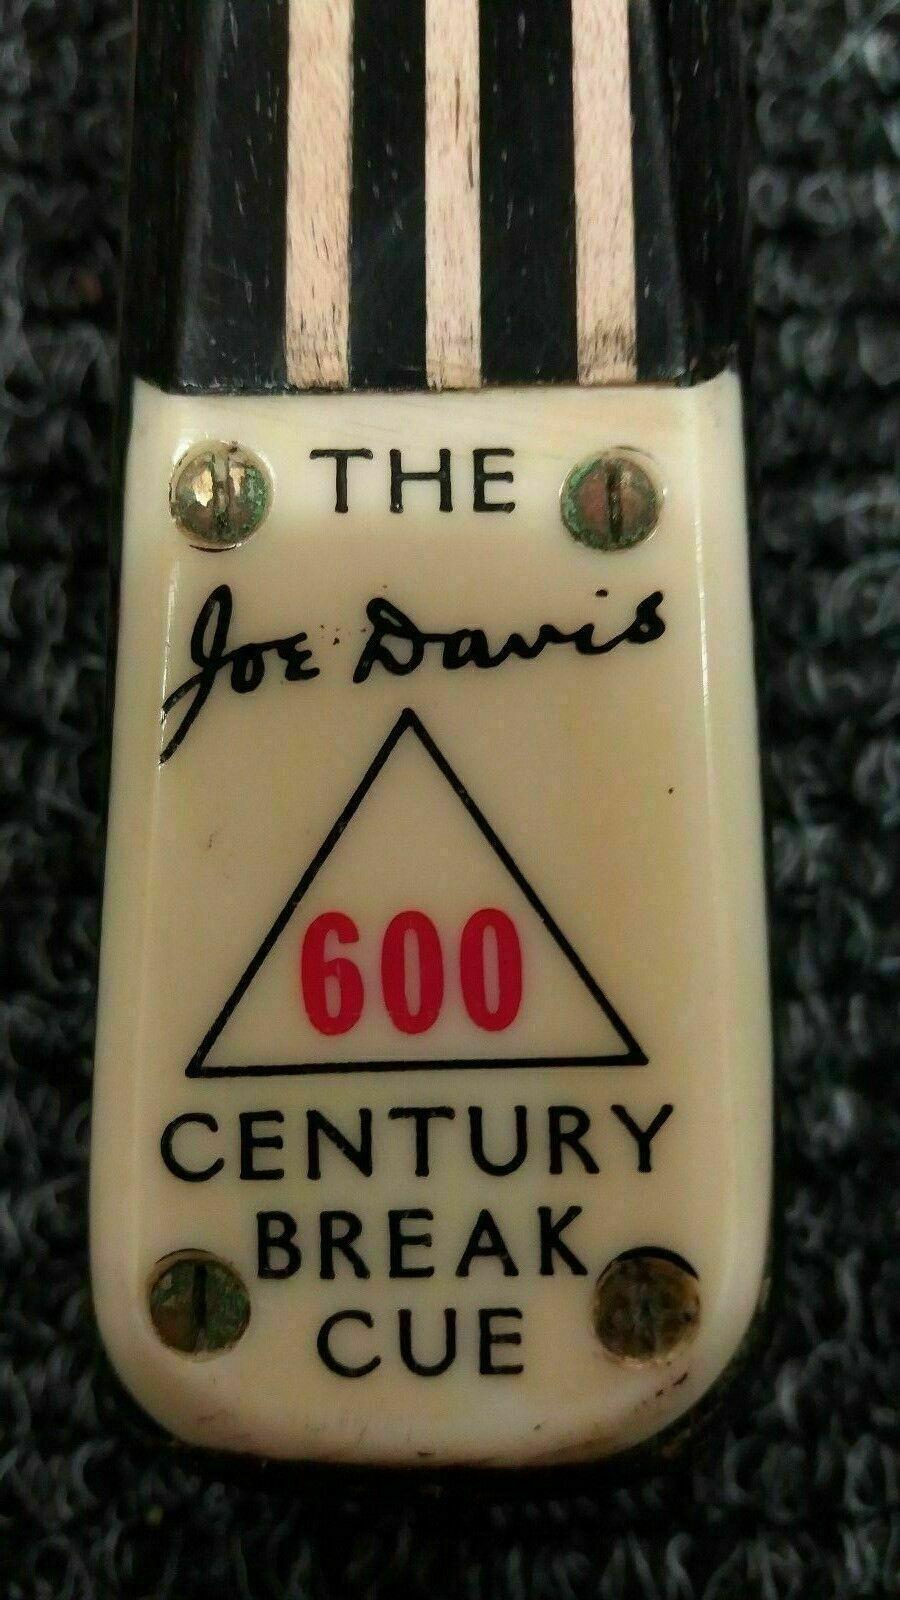 JOE DAVIS (ANTIQUE) 600 CENTURY BREAK SNOOKER CUE - 600